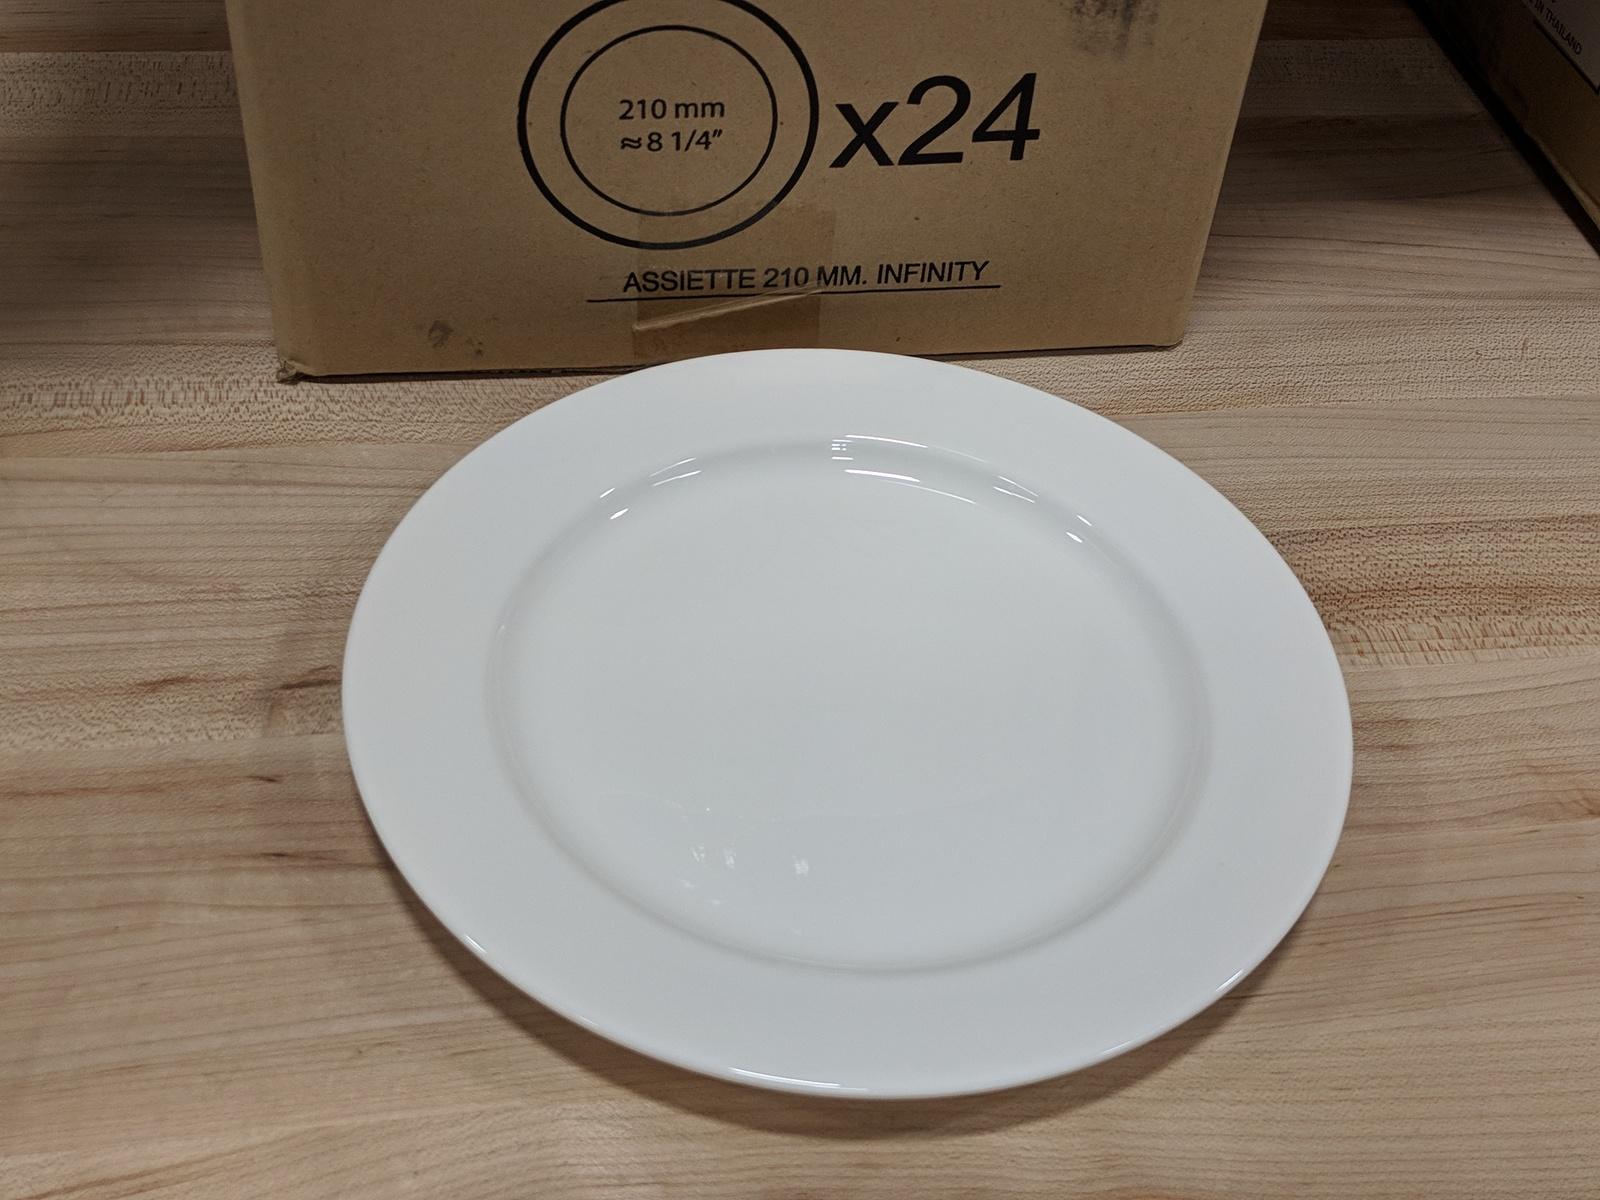 "Lot 28 - 8-1/4"" Infinity Salad/Dessert Plates - Lot of 24 (1 Case), Arcoroc R1004"